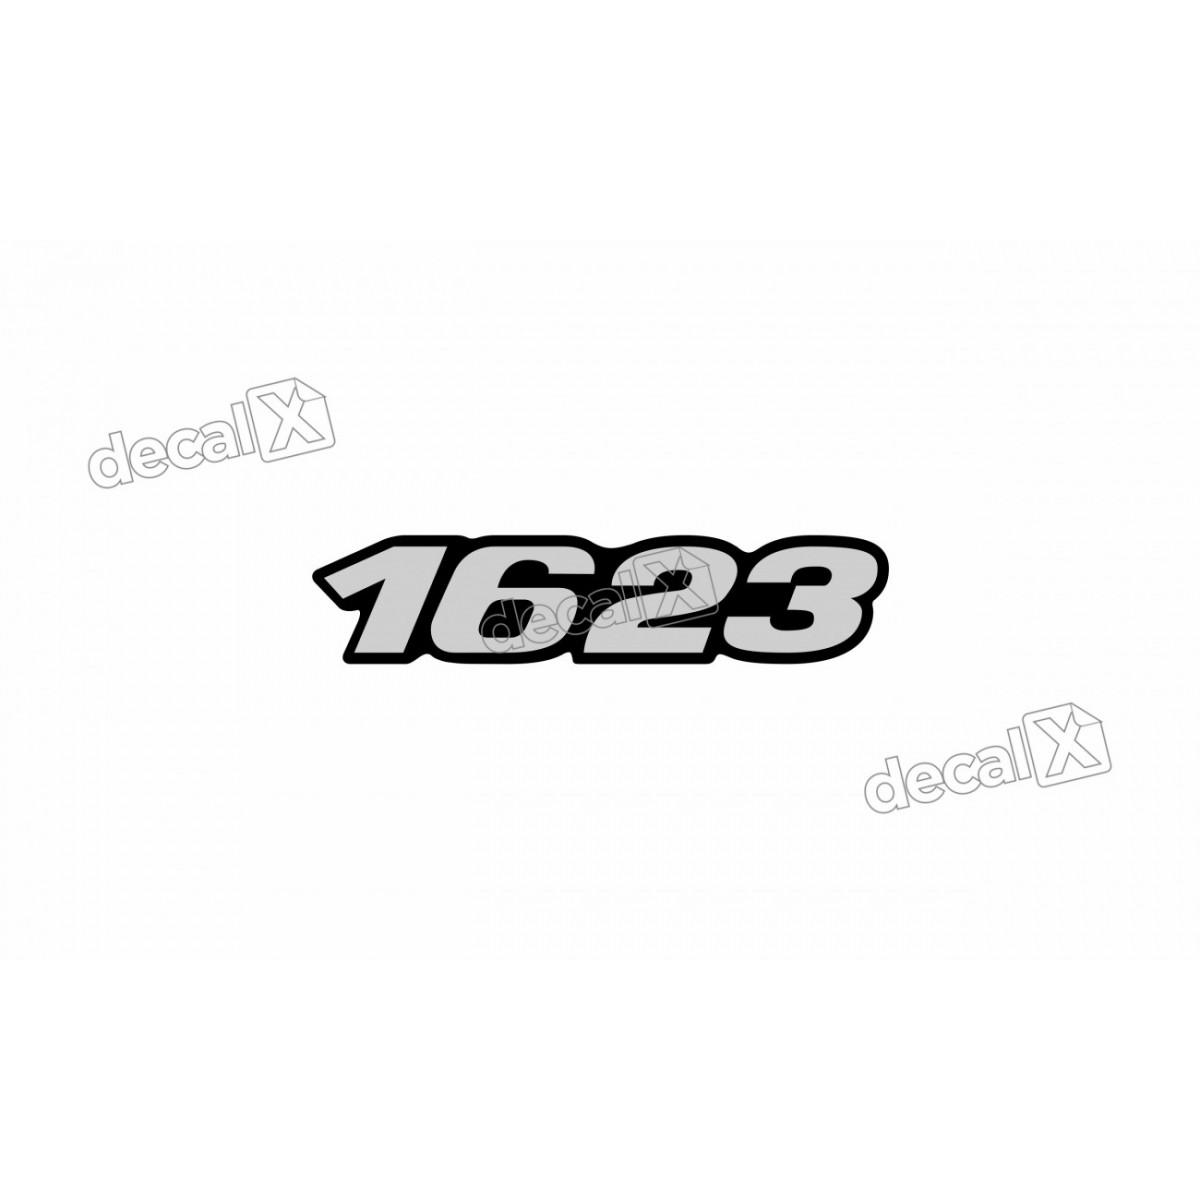 Adesivo Emblema Resinado Mercedes 1623 Cm50 Decalx